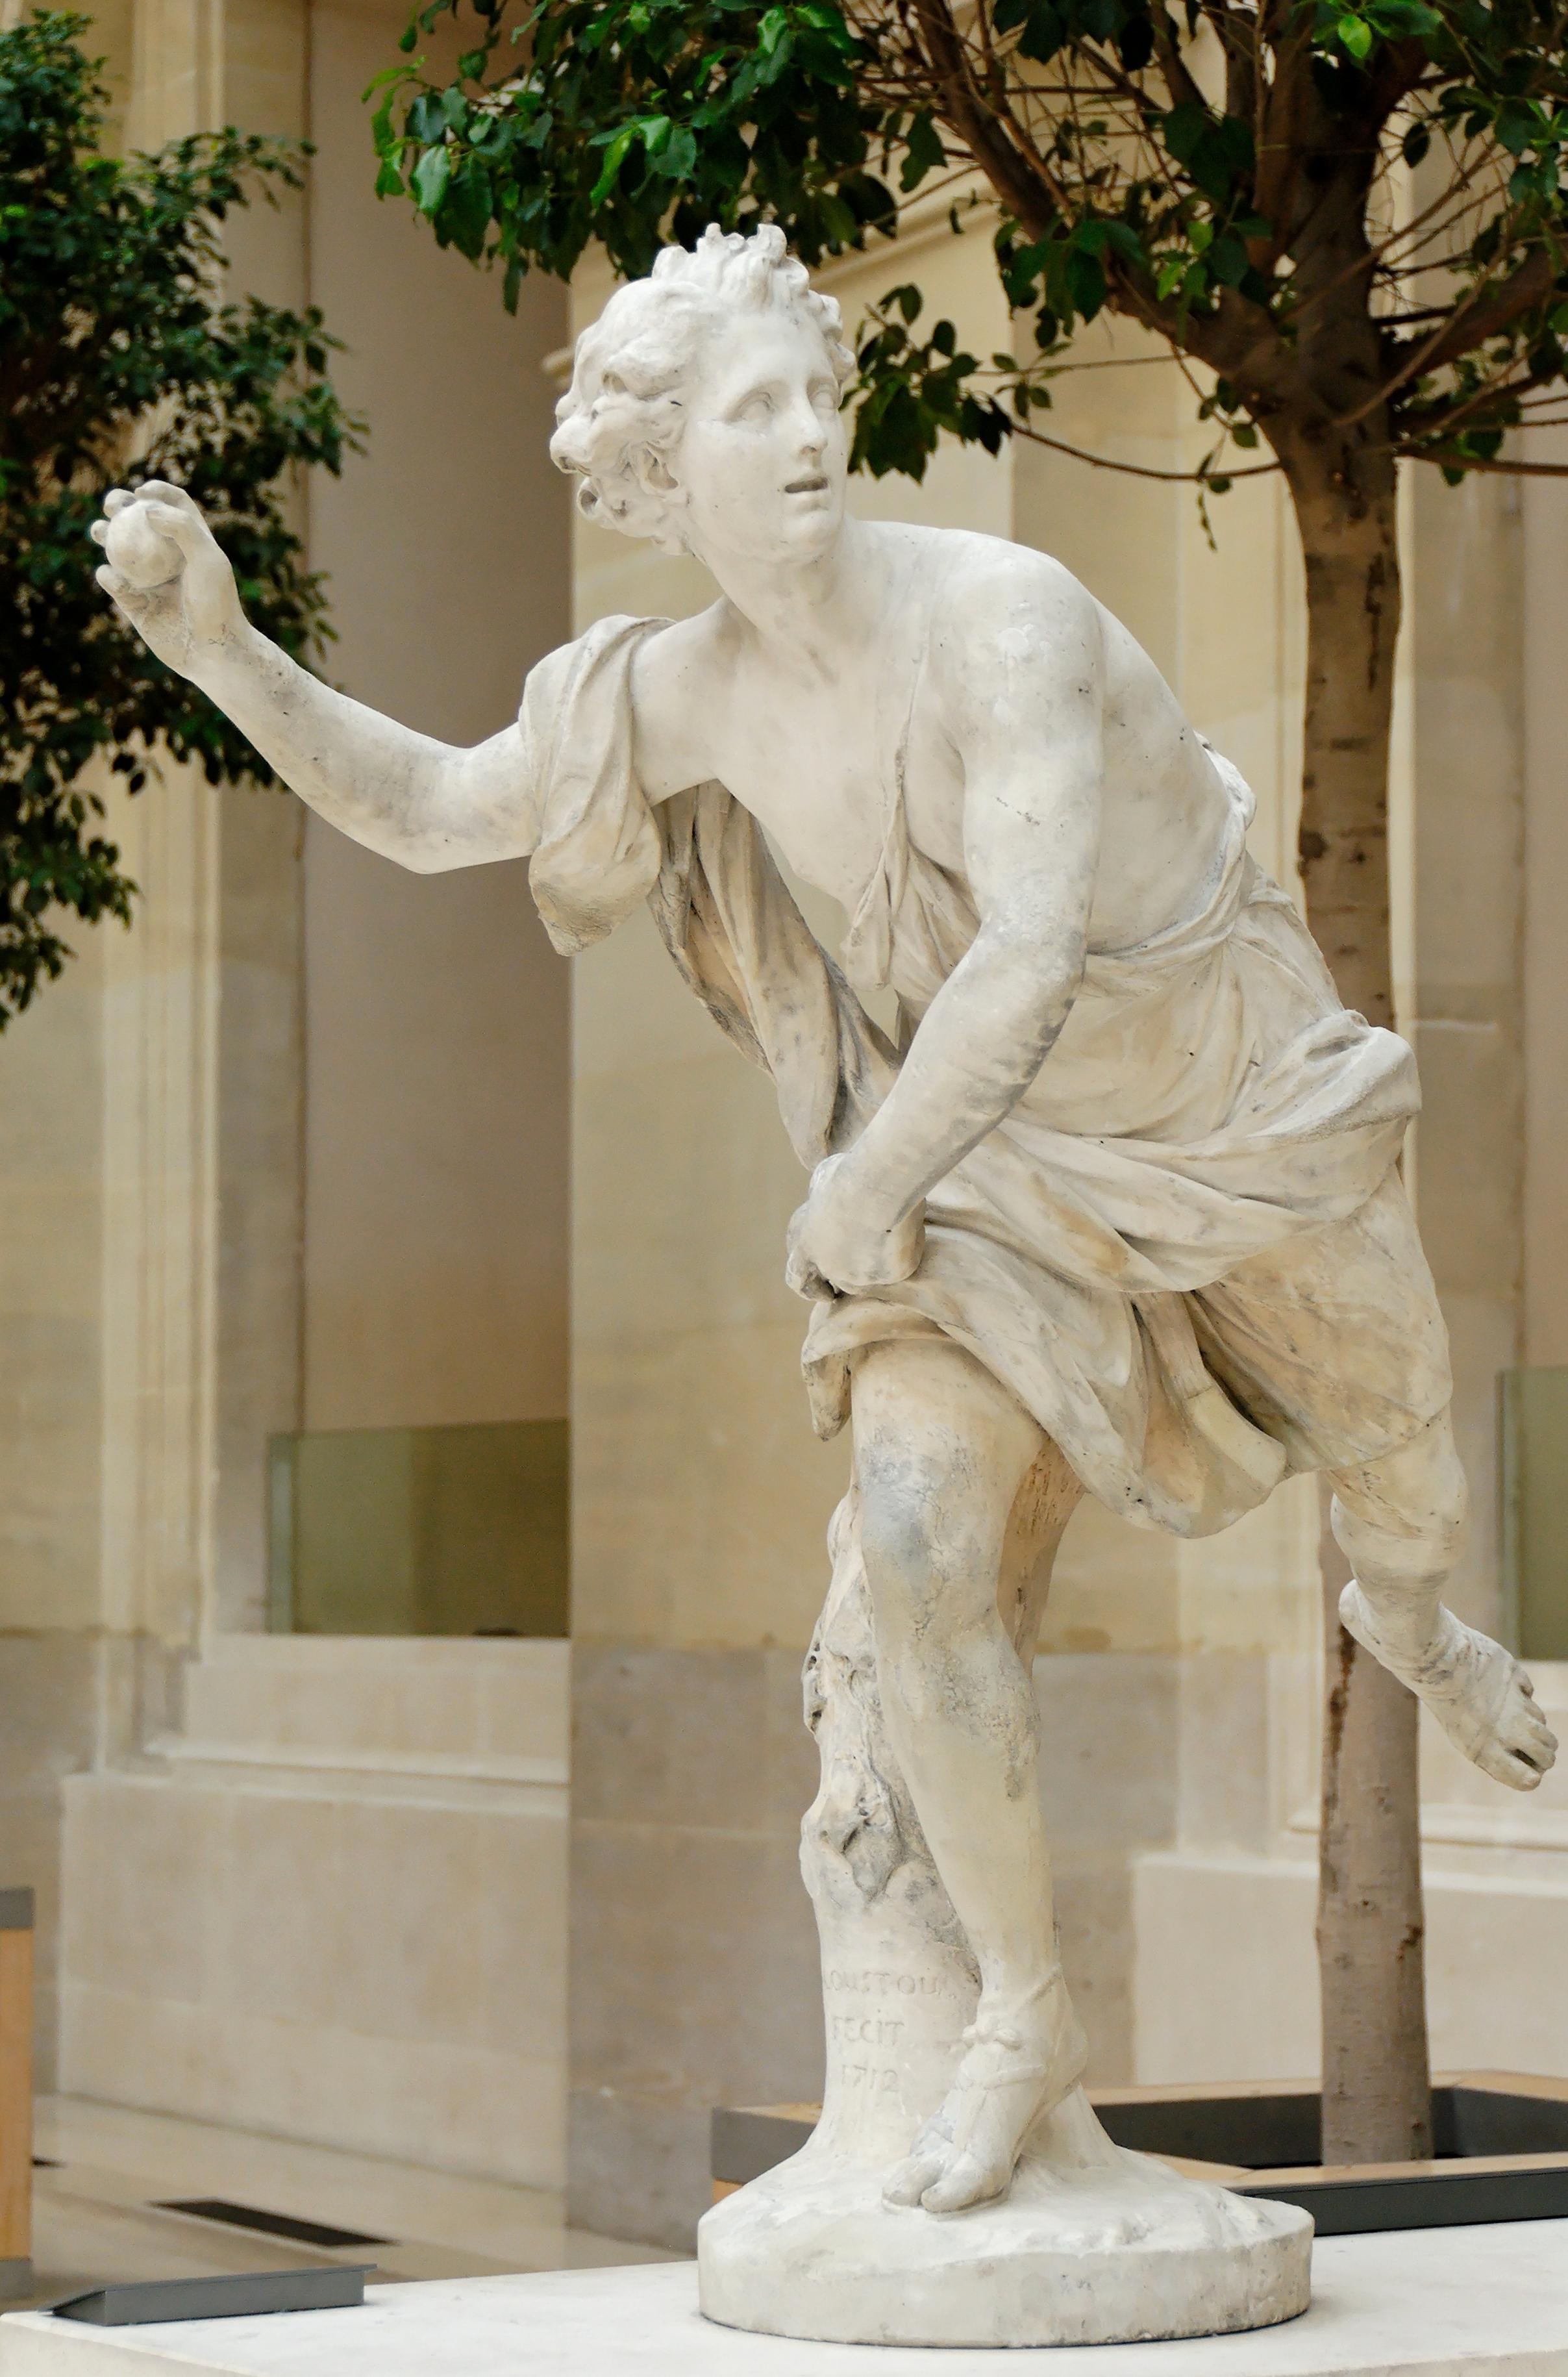 http://upload.wikimedia.org/wikipedia/commons/3/30/Hippomenes_Coustou_Louvre_MR1810.jpg